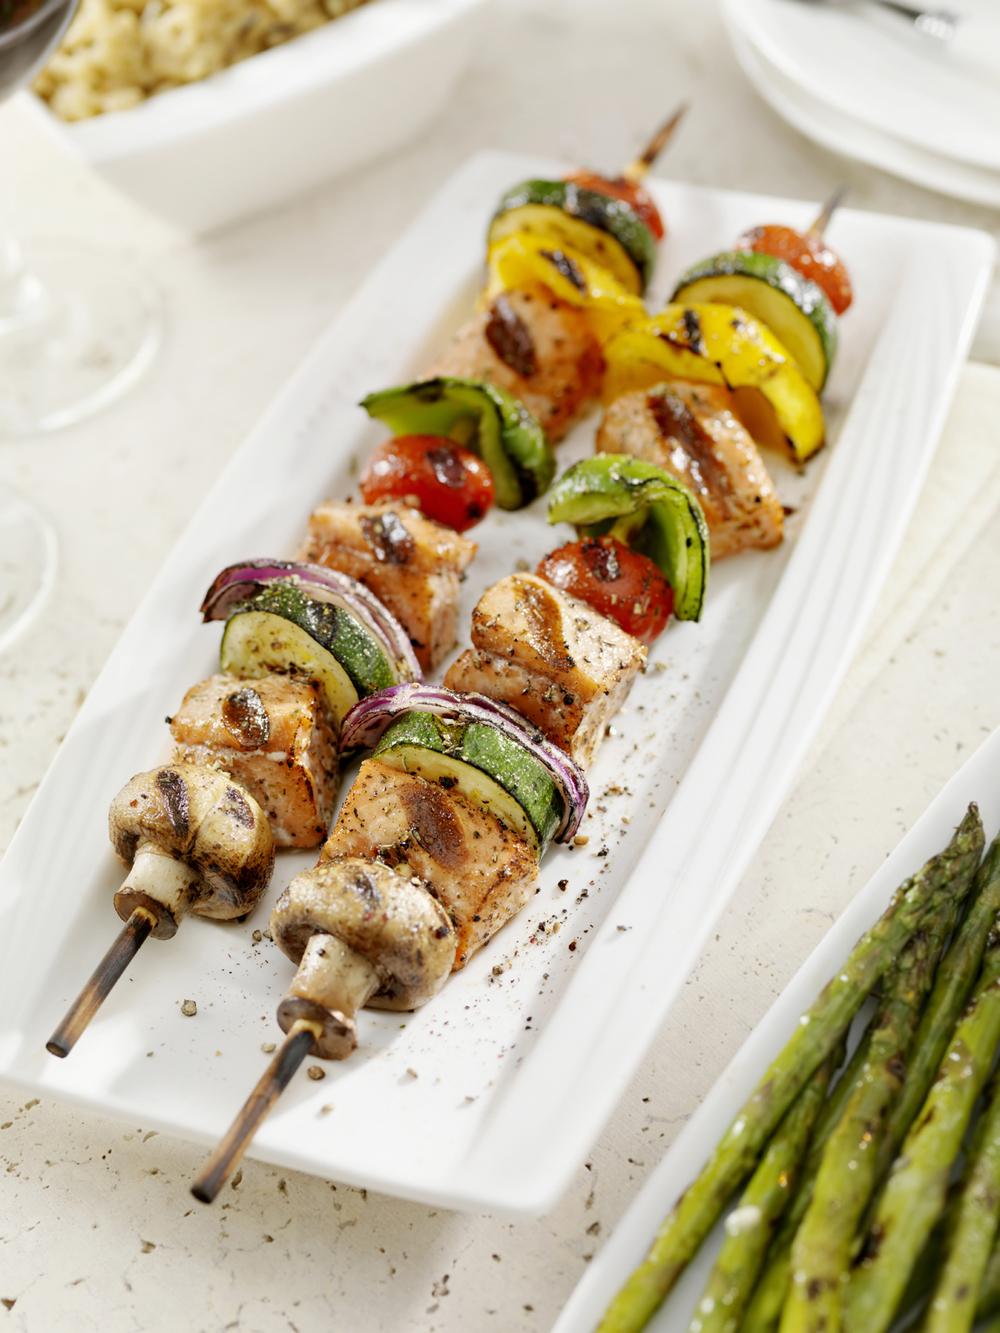 kebabiStock_000016909095Large.jpg